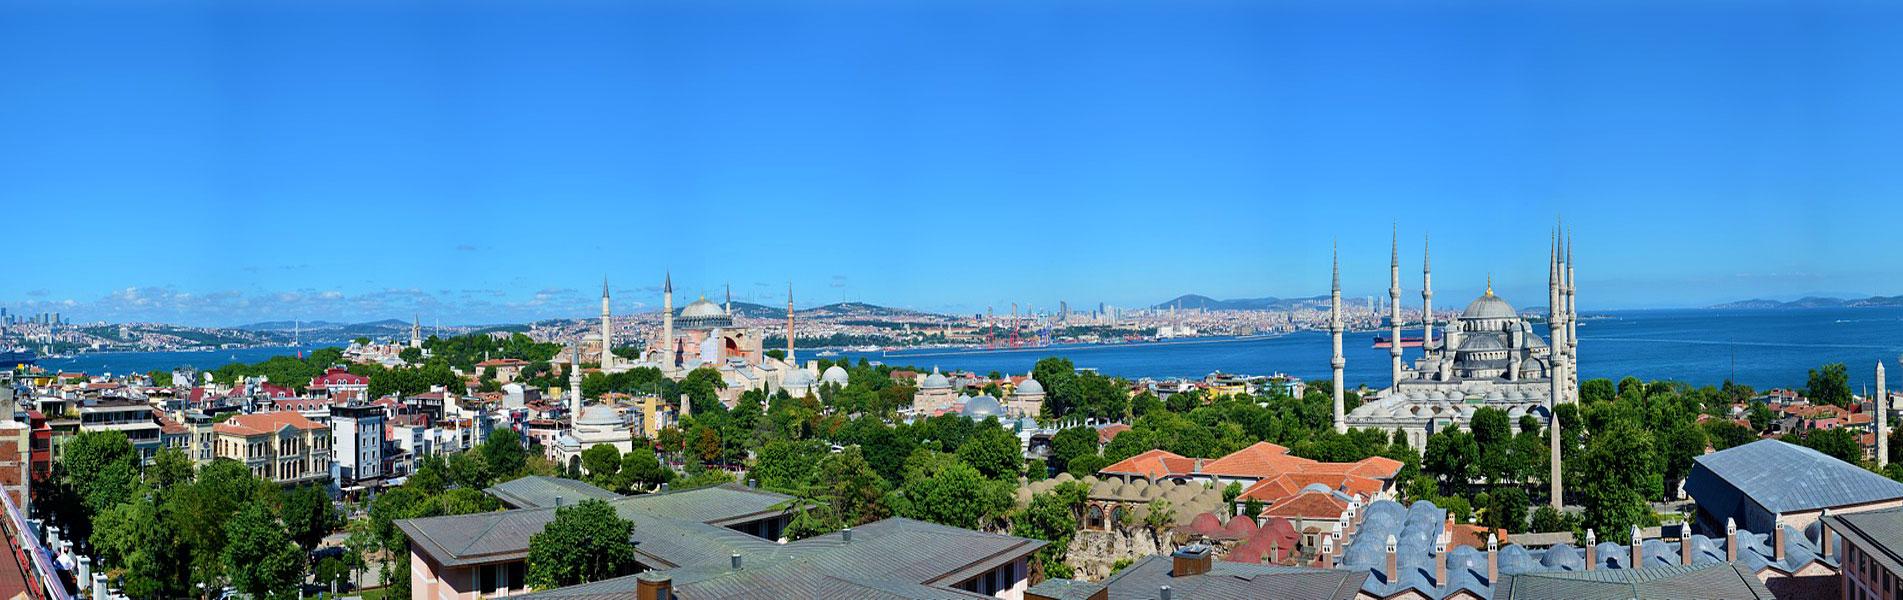 Istanbul Old City, Turkey